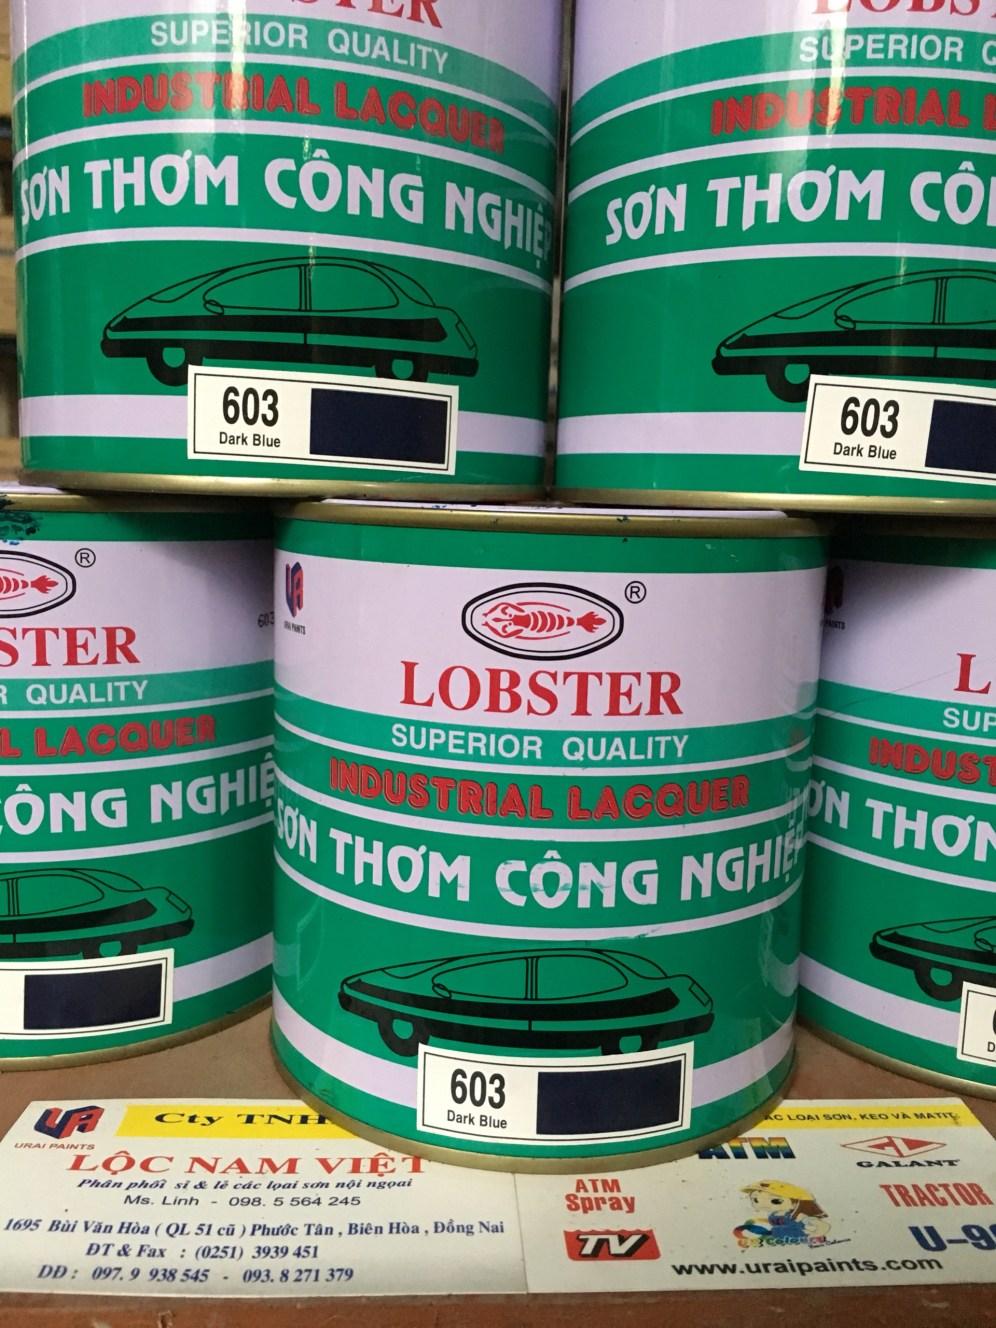 SON THOM CN LOBSTER 603 (1)